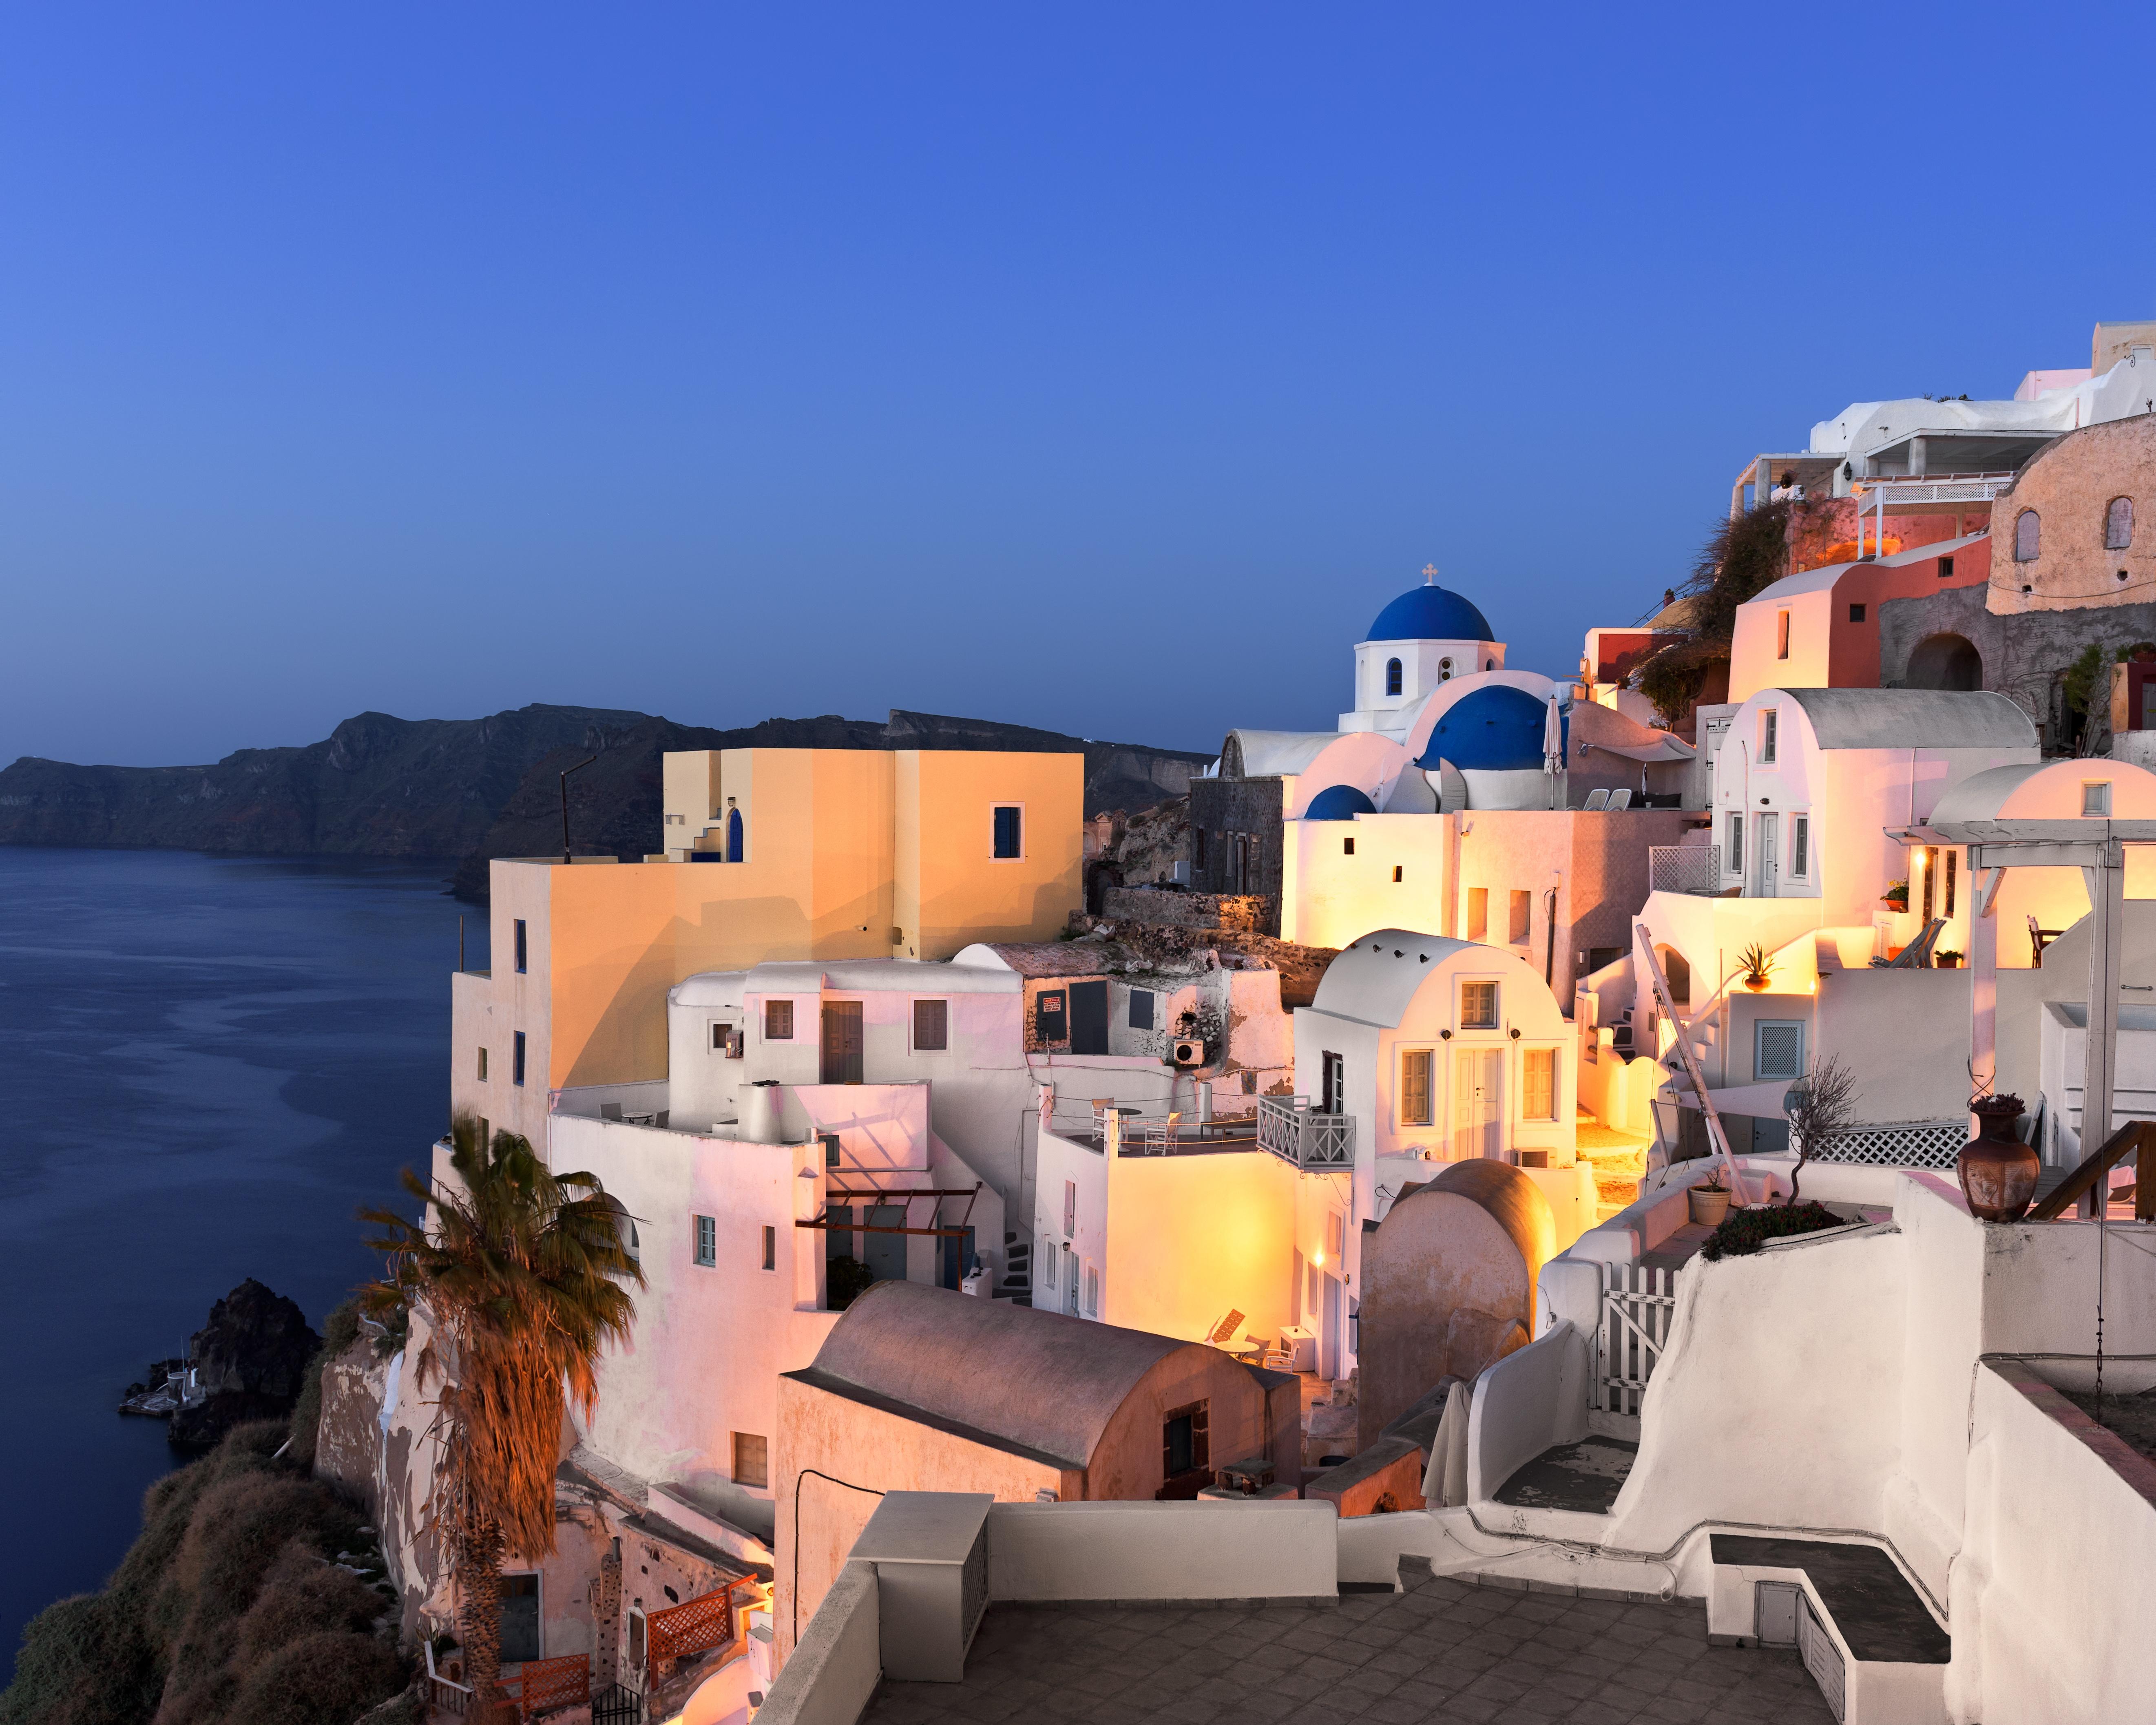 Santorini, Greece/ Courtesy of Shutterstock